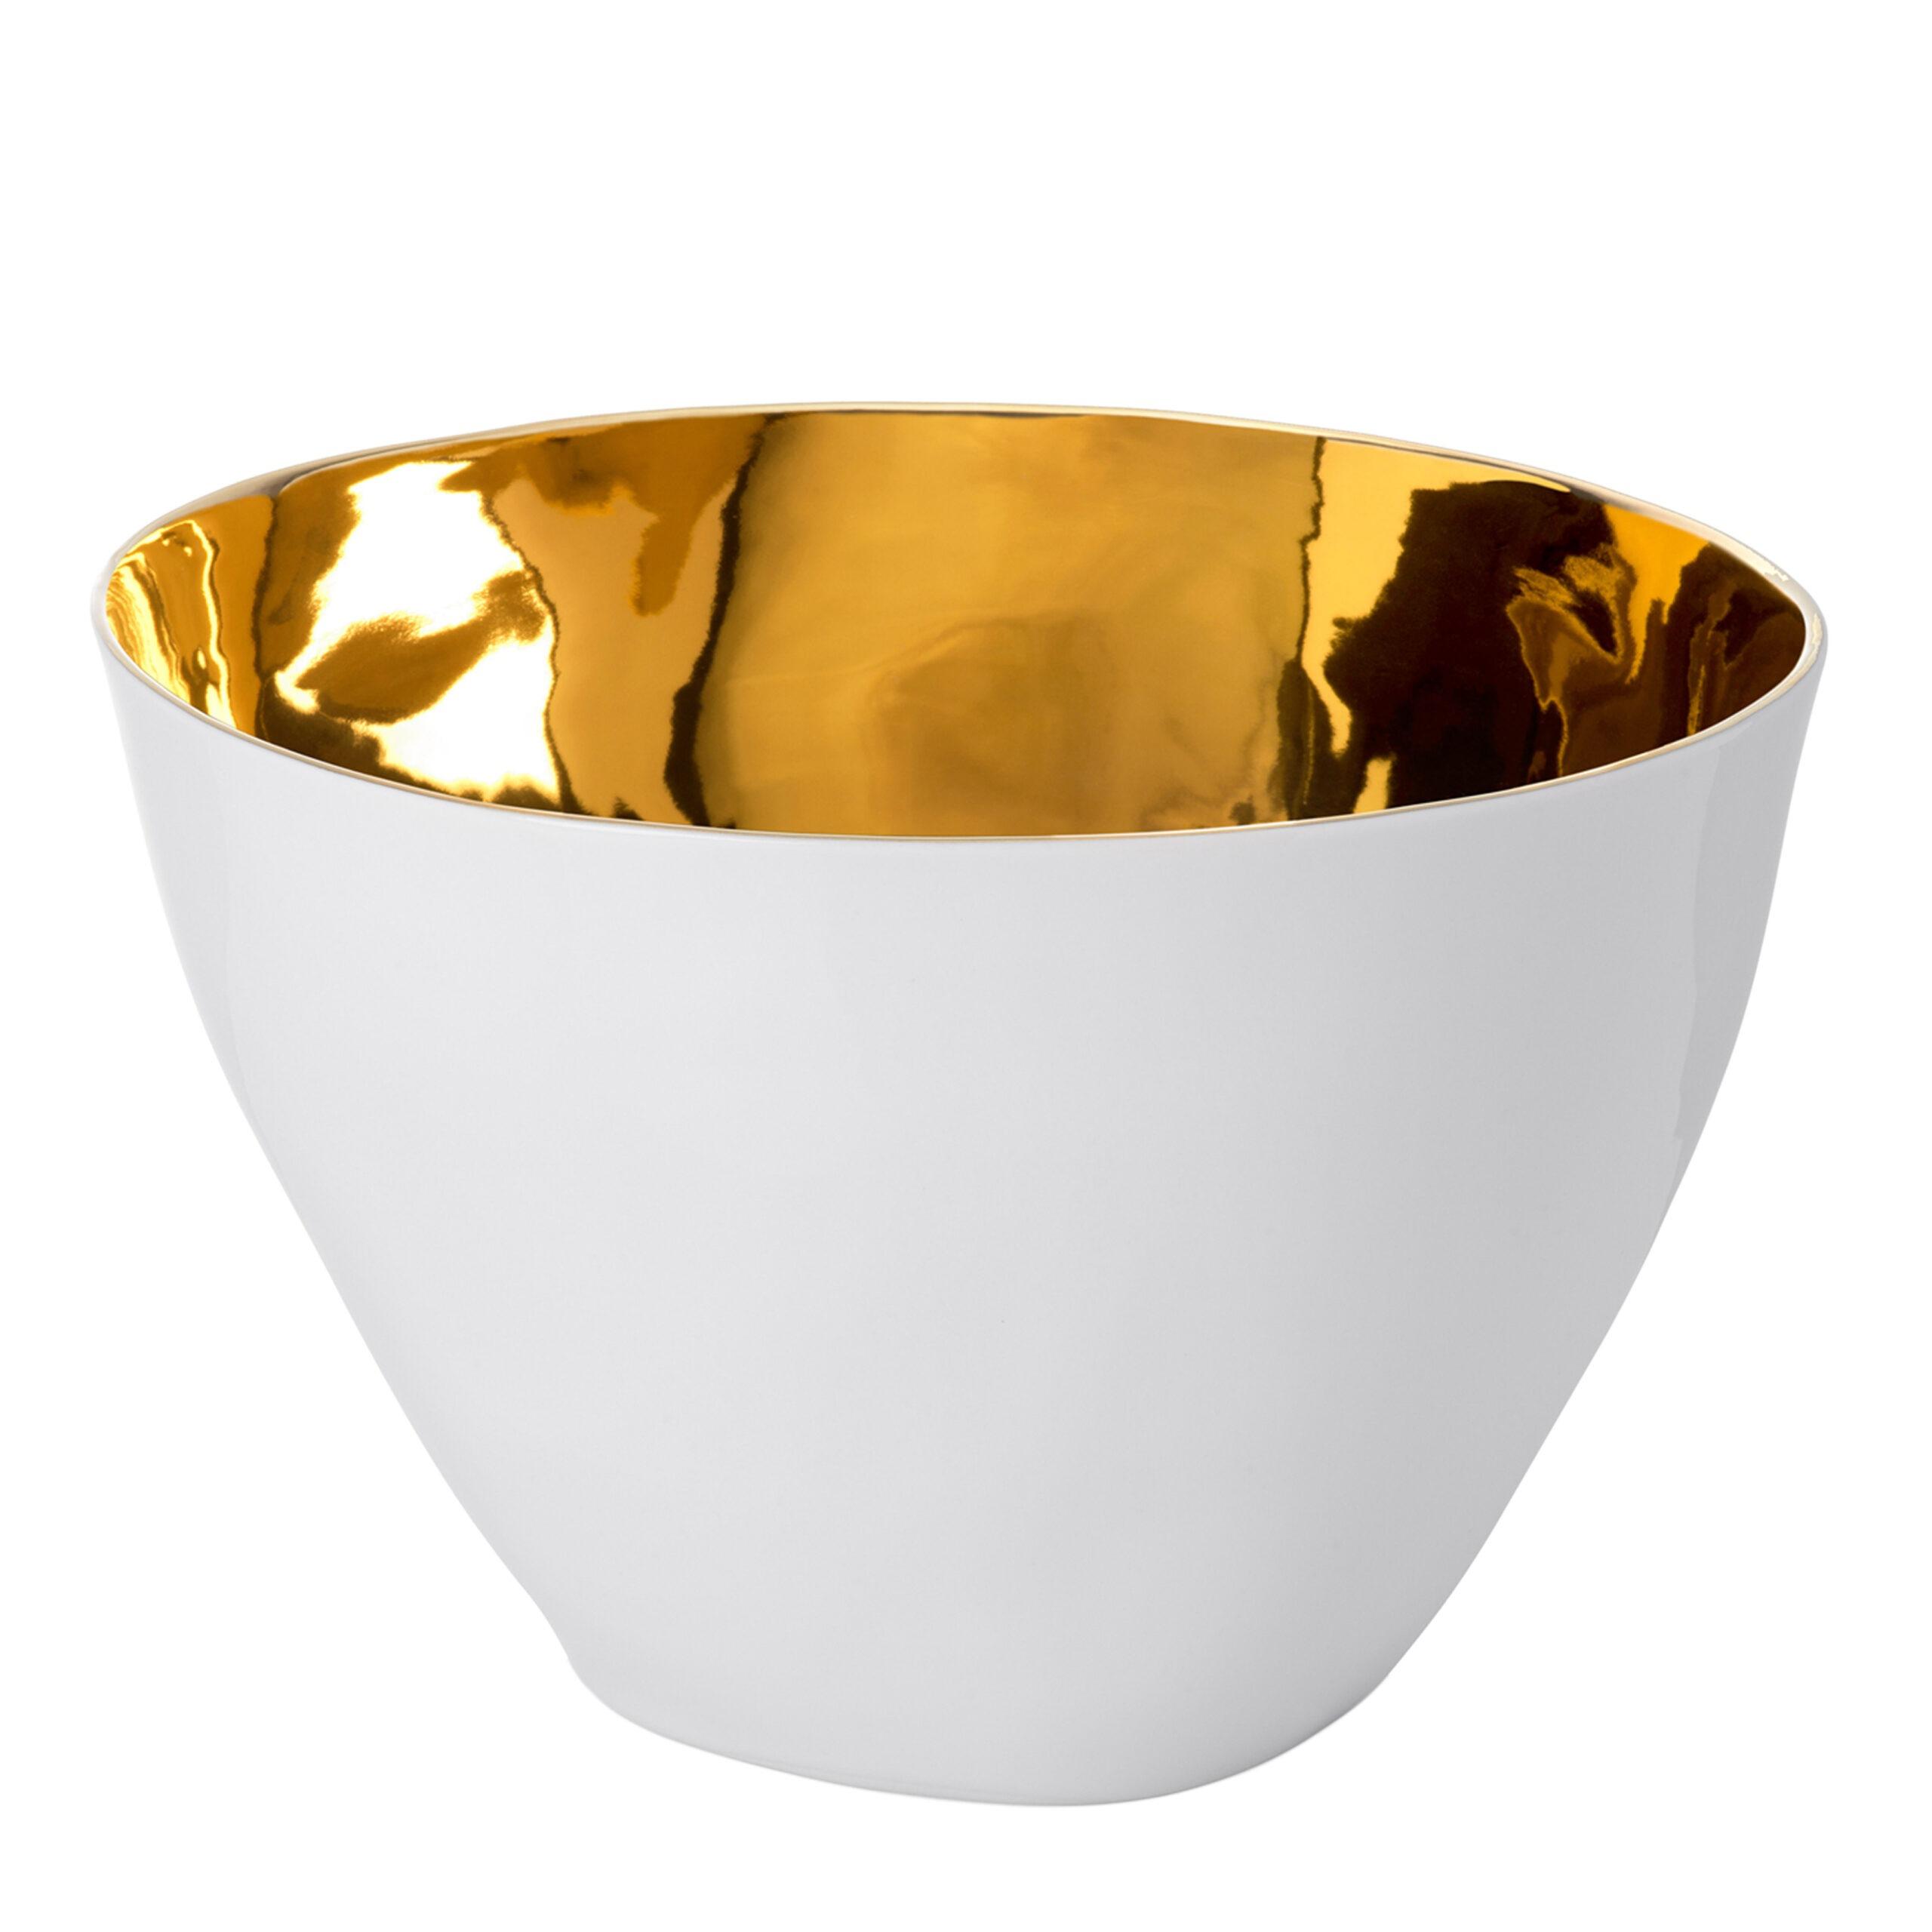 Real Gold glazed interior